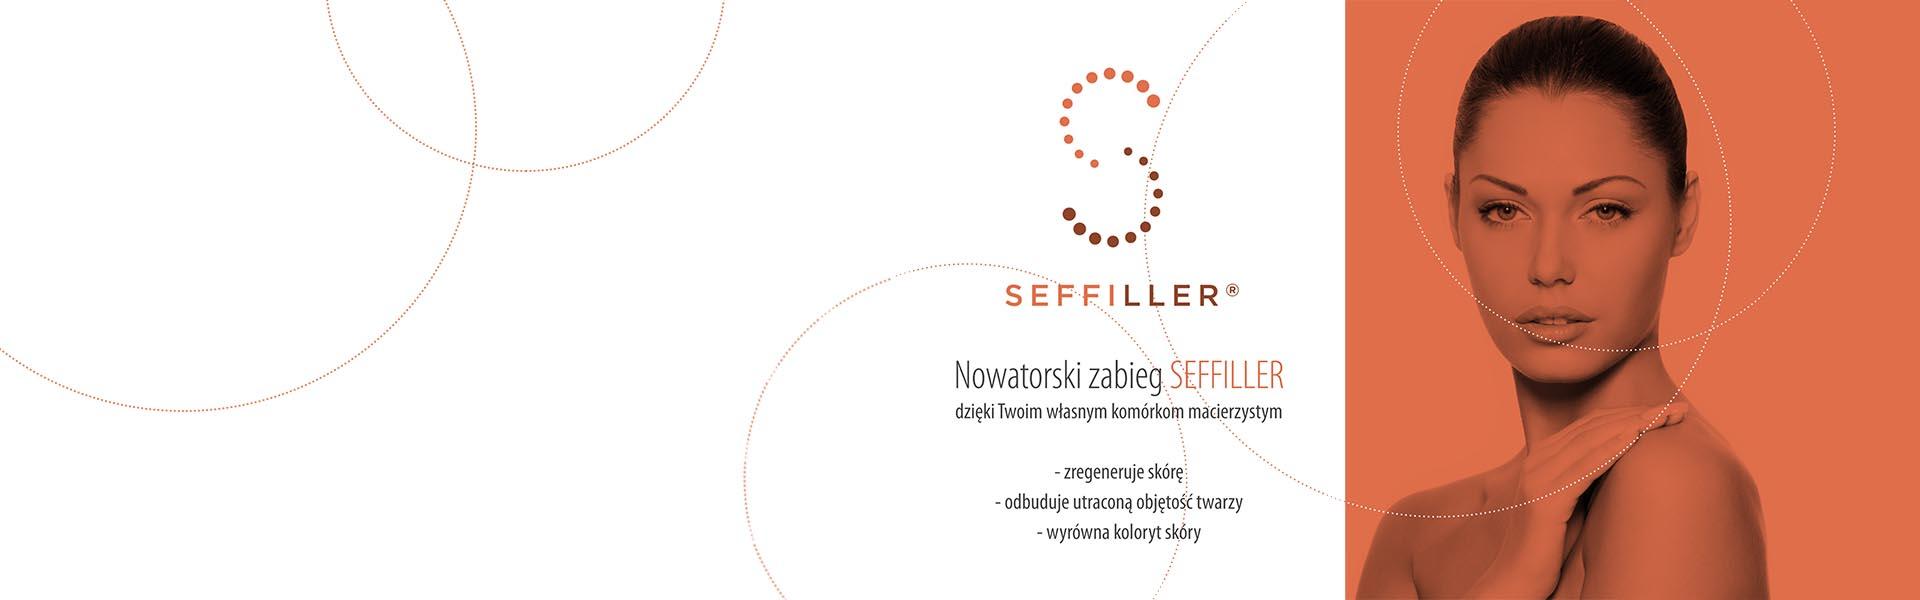 Seffiller - Medycyna Estetyczna Kraków